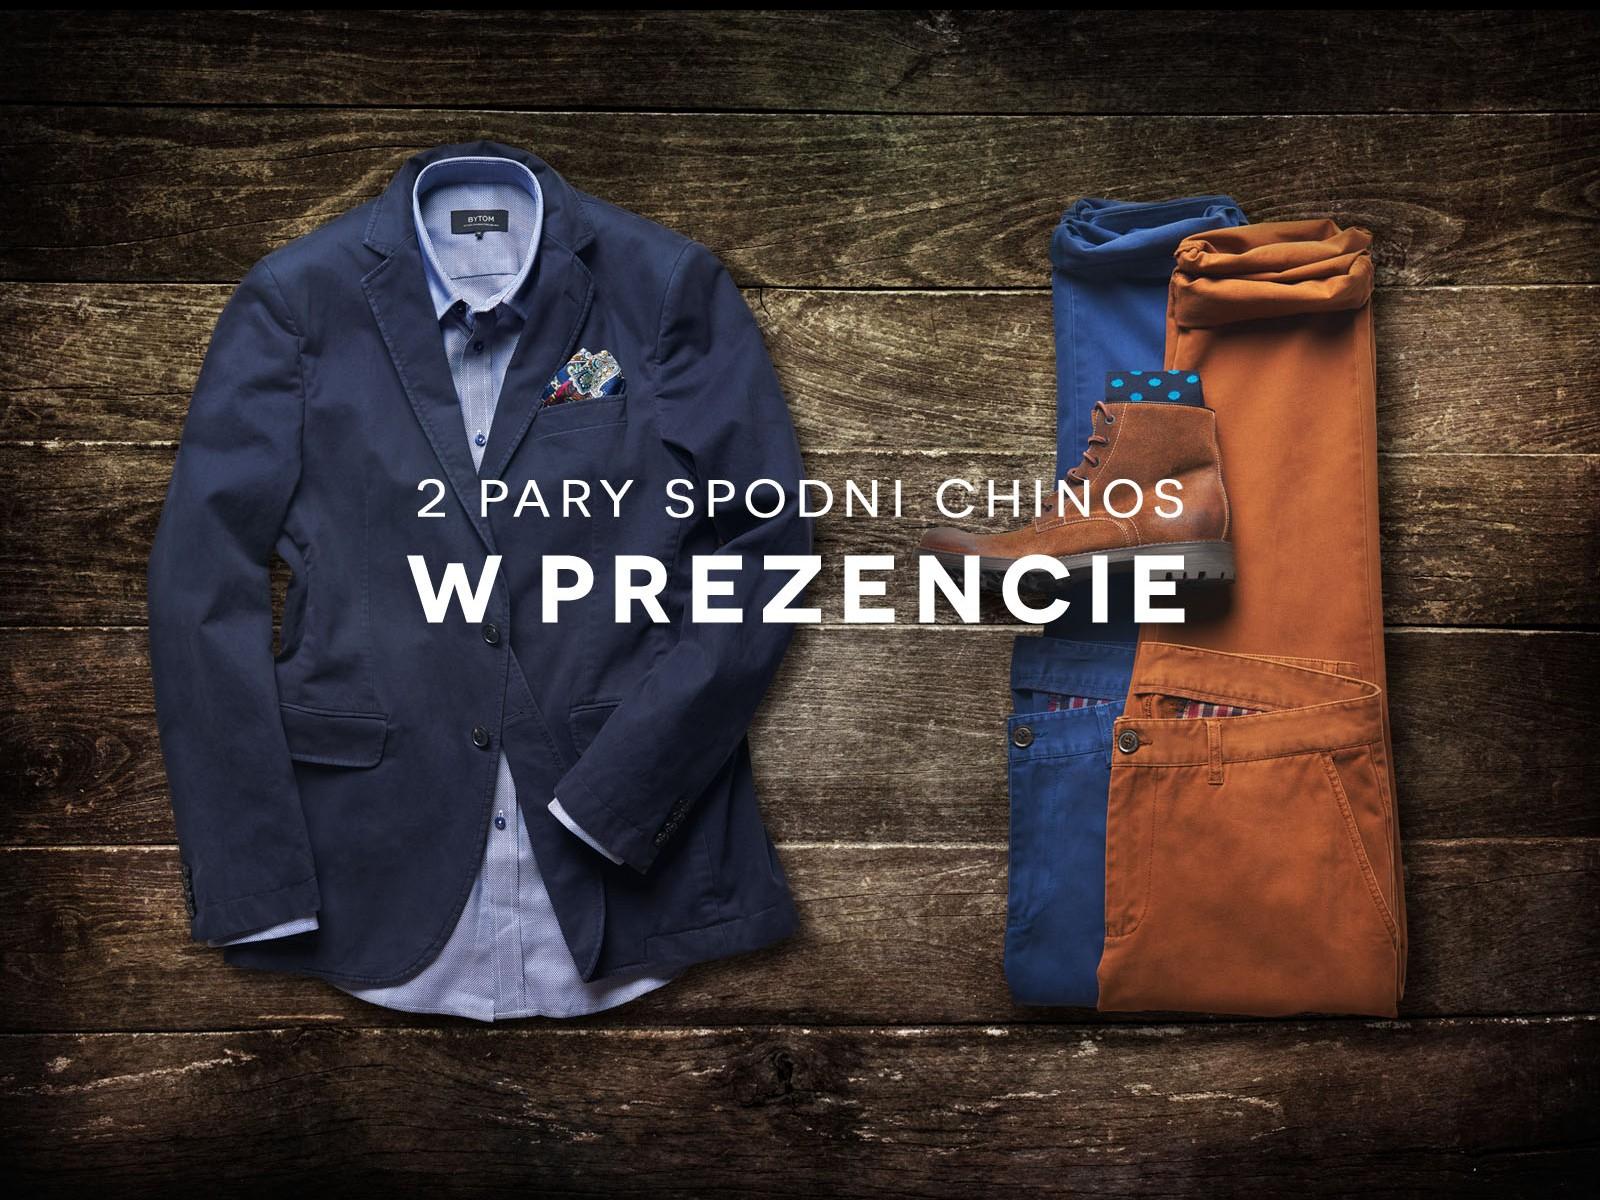 2 pary spodni chinos GRATIS do zakupów @ Bytom